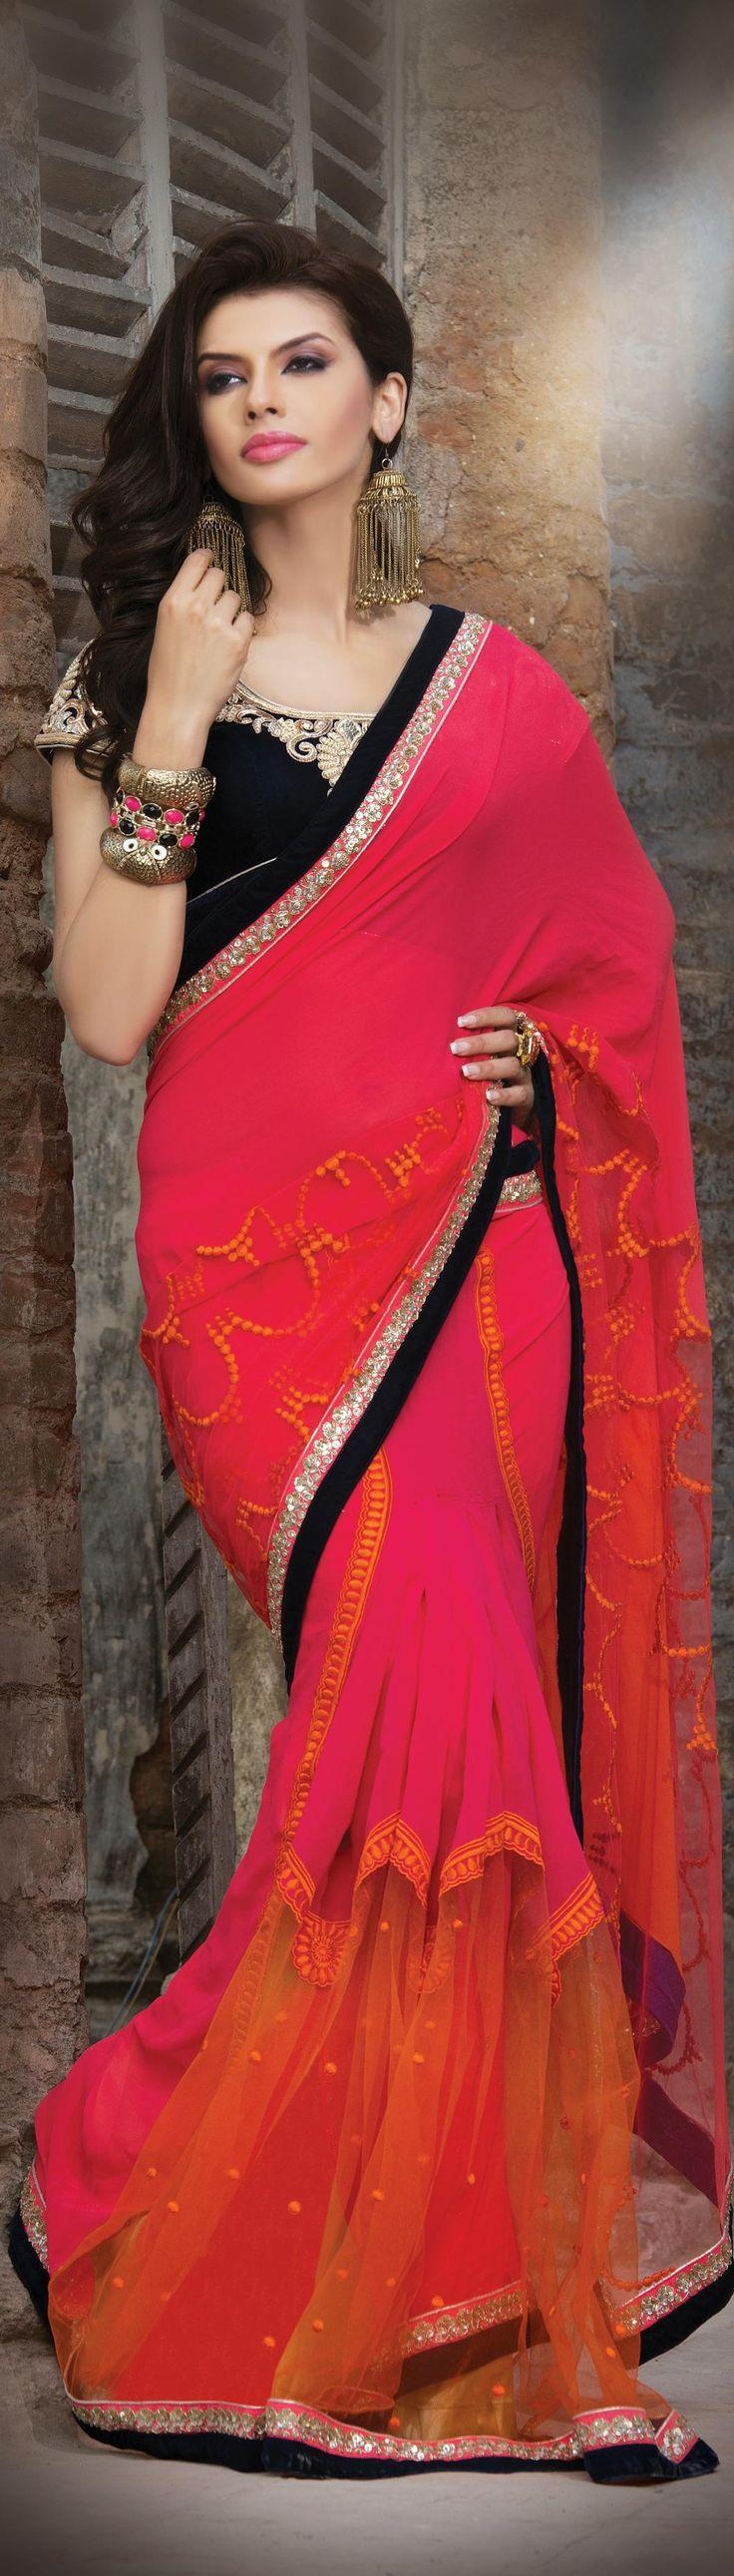 Super stylish #Fuchsia and #Coral #Partywear #Lehenga #Saree available online at http://www.vivaahfashions.com/Sarees/plushy-coral-&-fuchsia-embroidered-saree